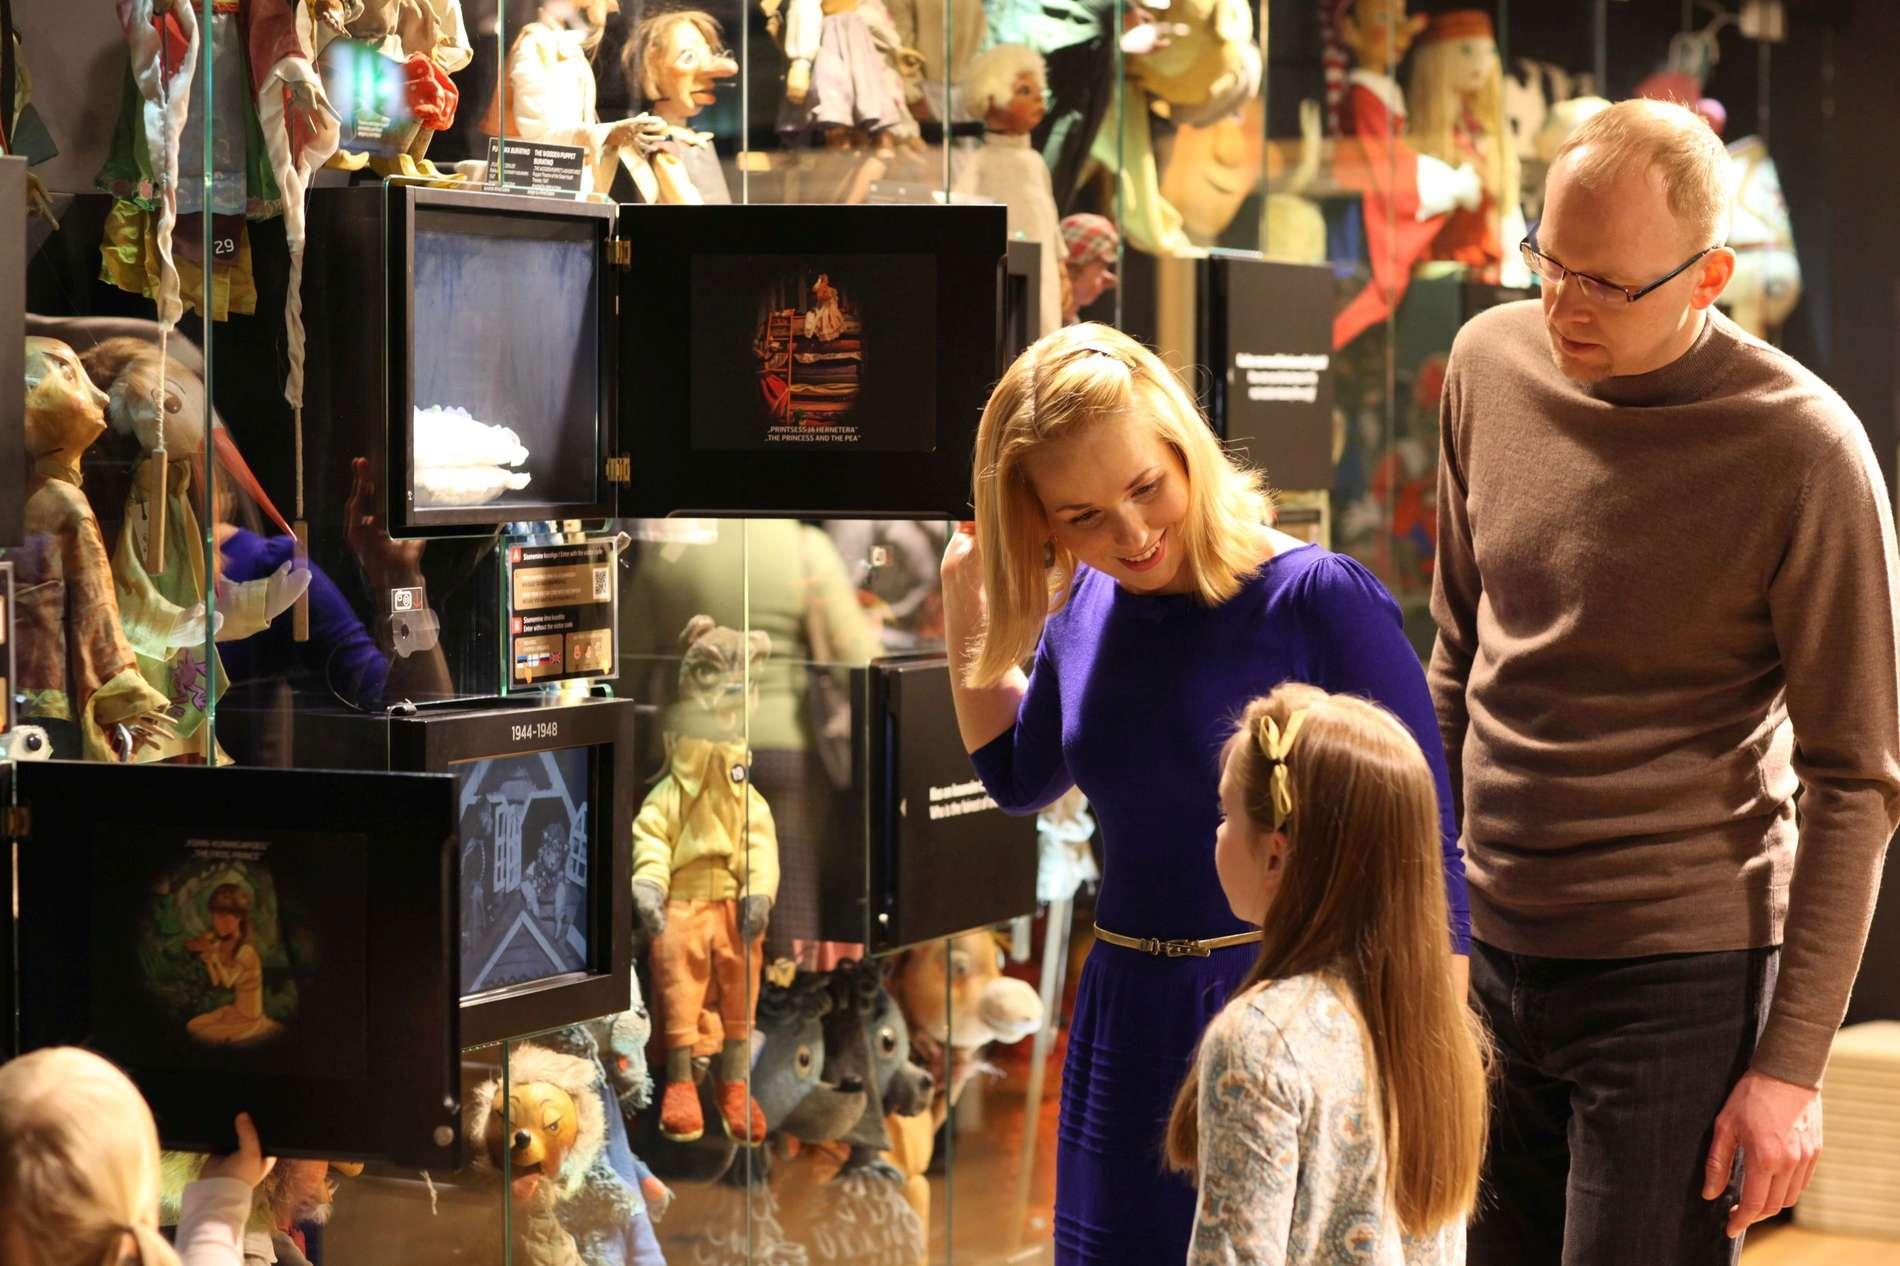 NUKU Museum of Puppet Arts in Tallinn, Estonia